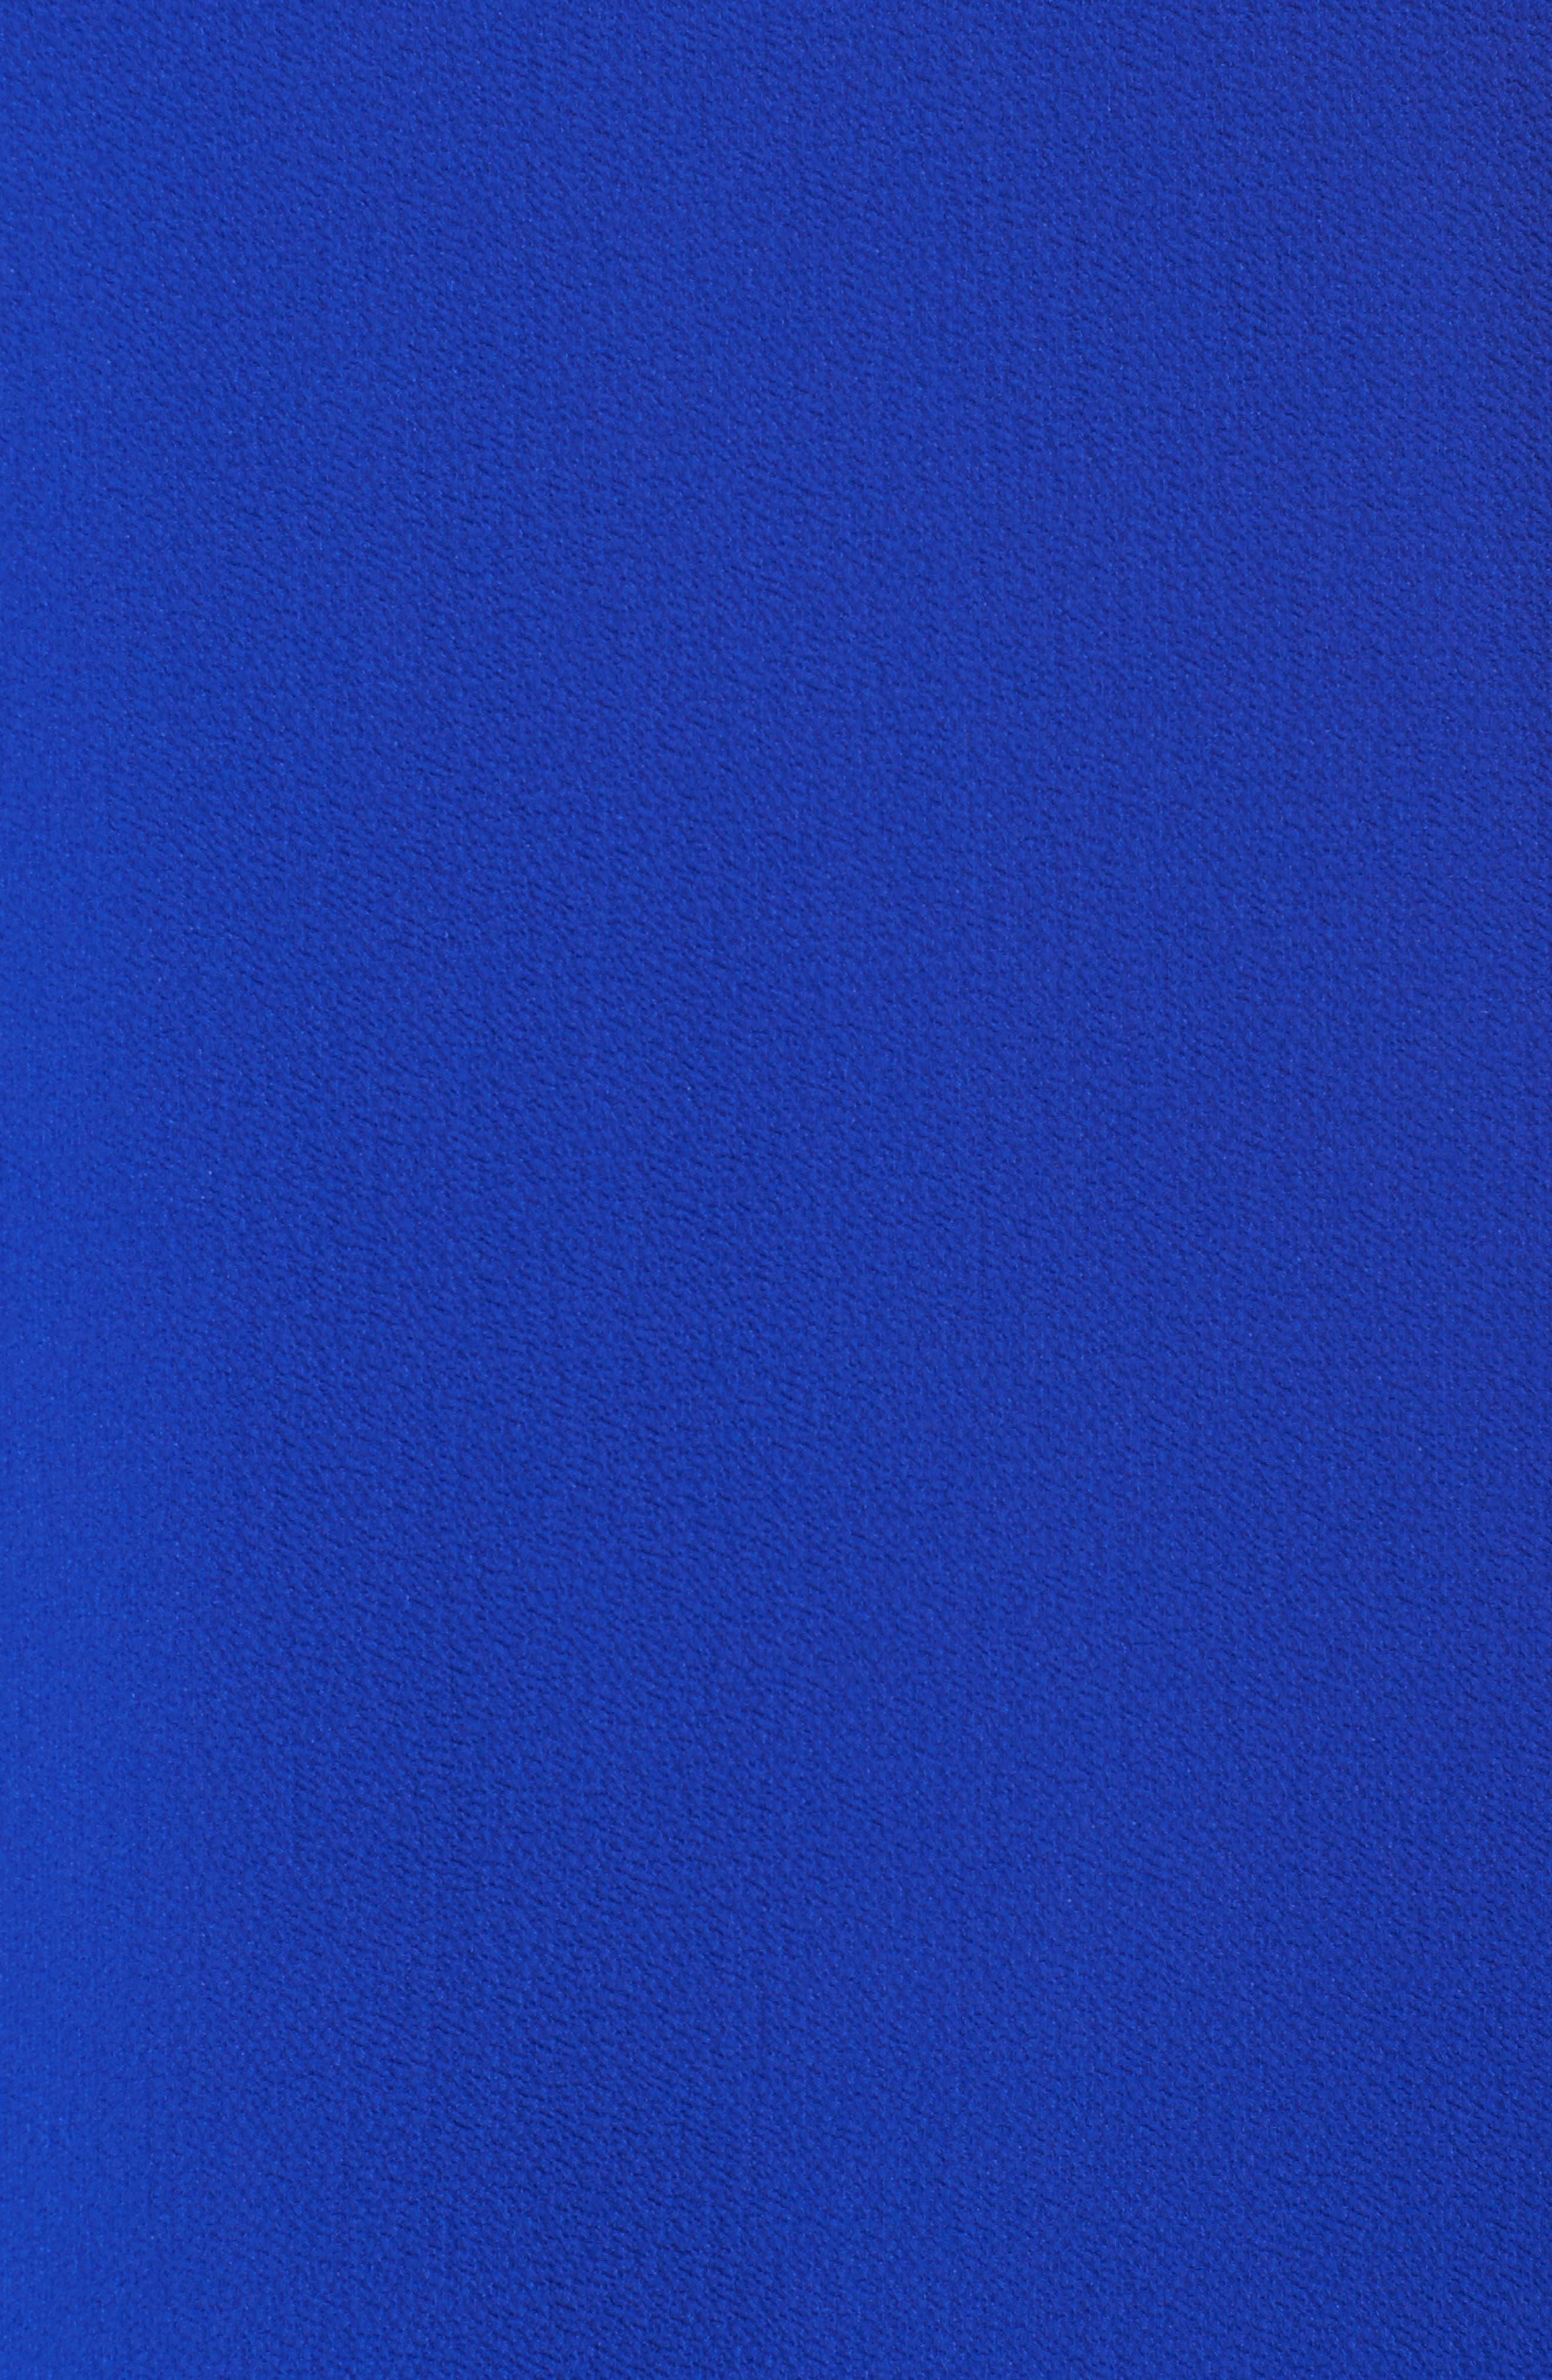 Bell Sleeve Blouse,                             Alternate thumbnail 25, color,